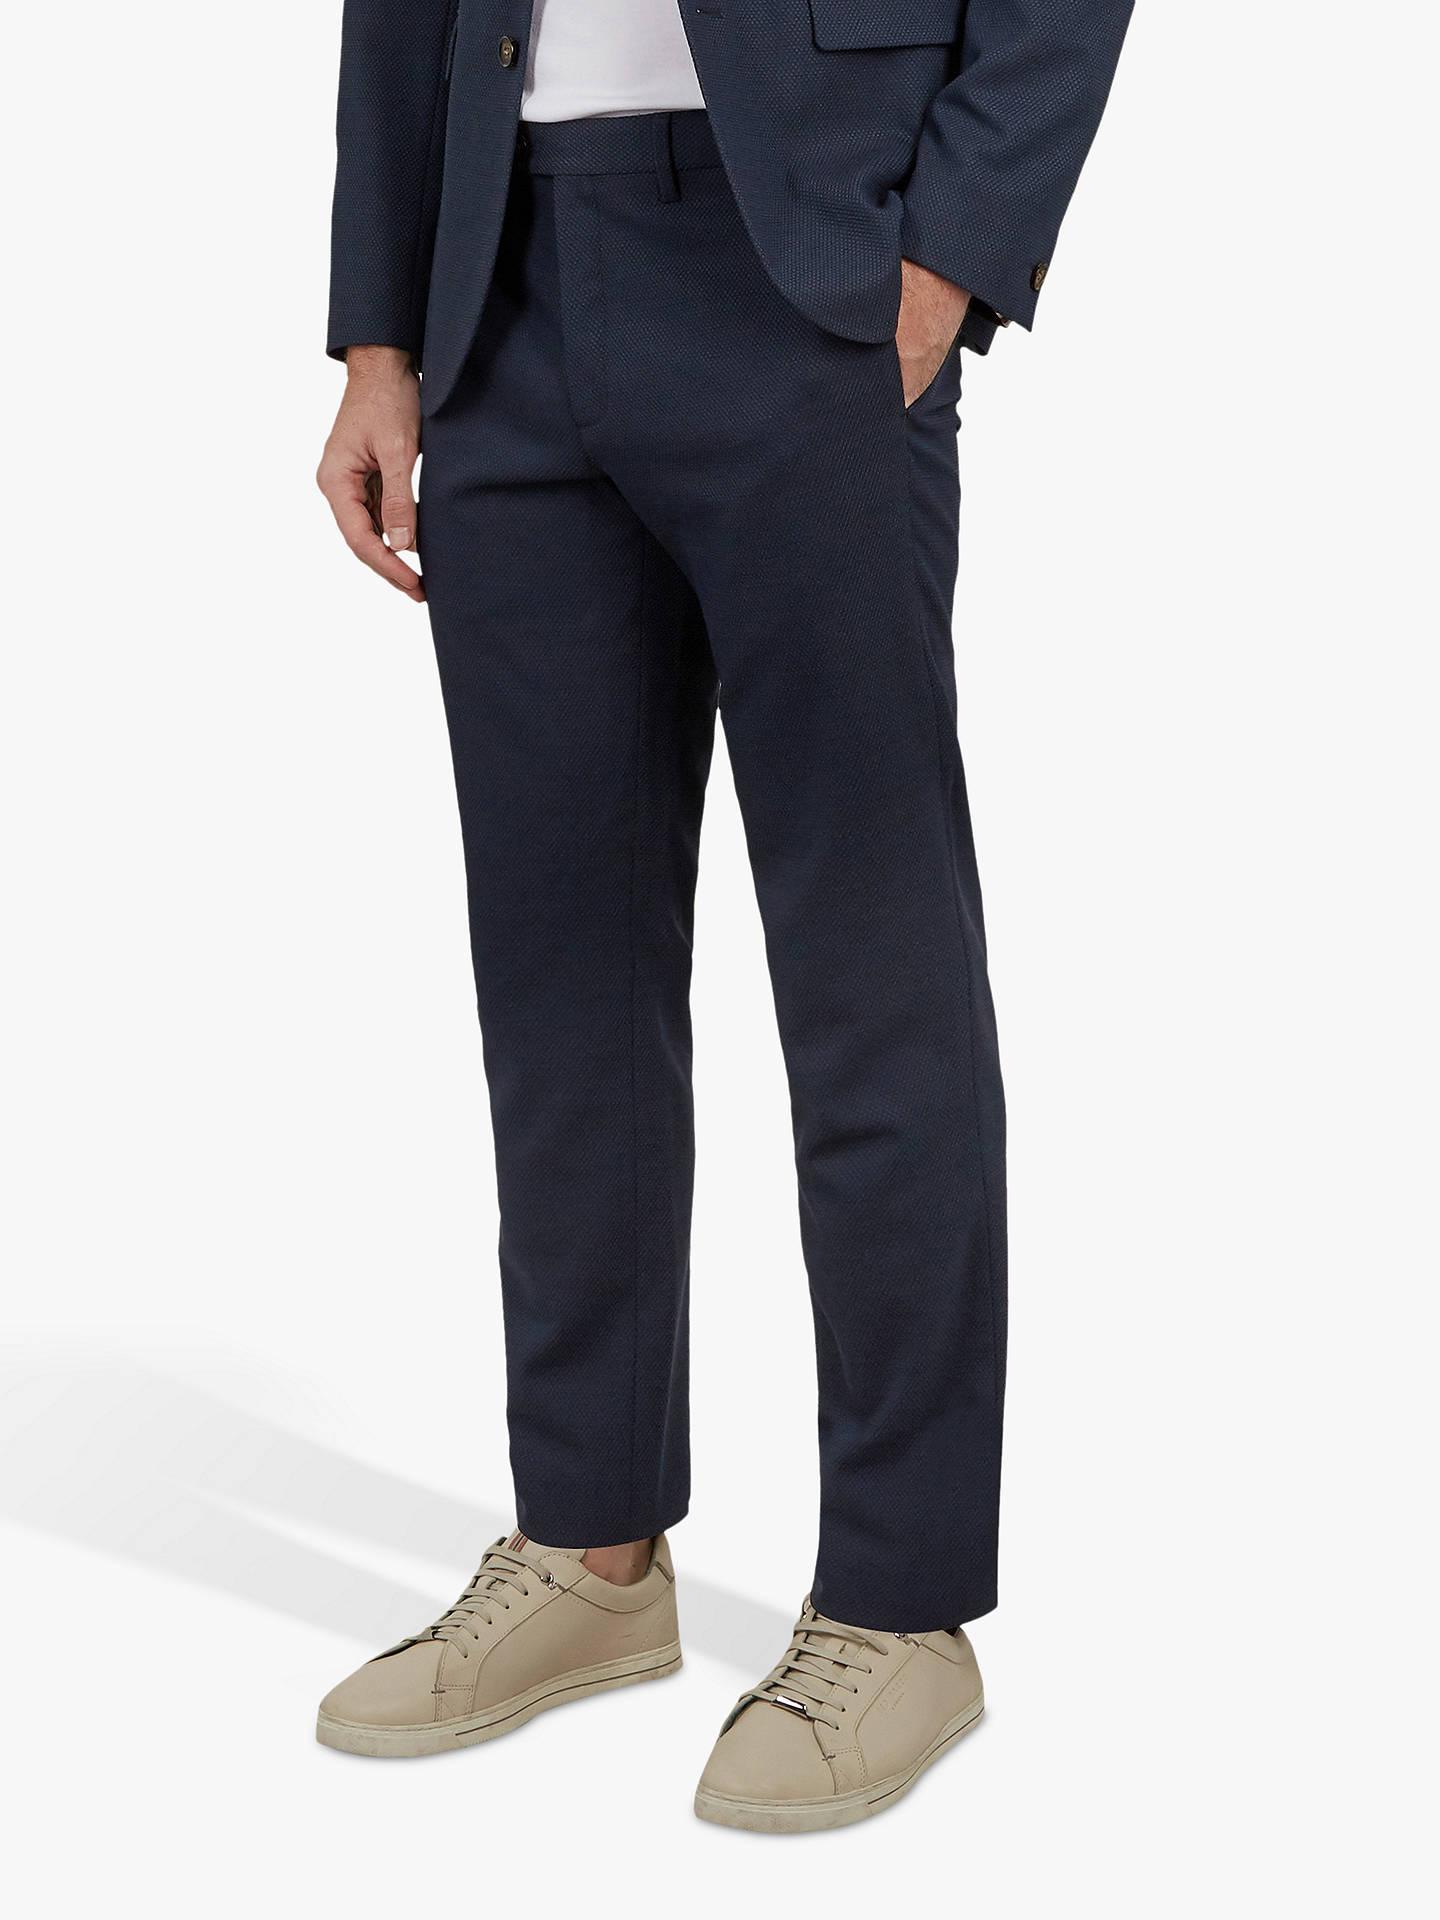 7176bfed4f1b Ted Baker Gorktro Textured Semi Plain Trousers at John Lewis   Partners